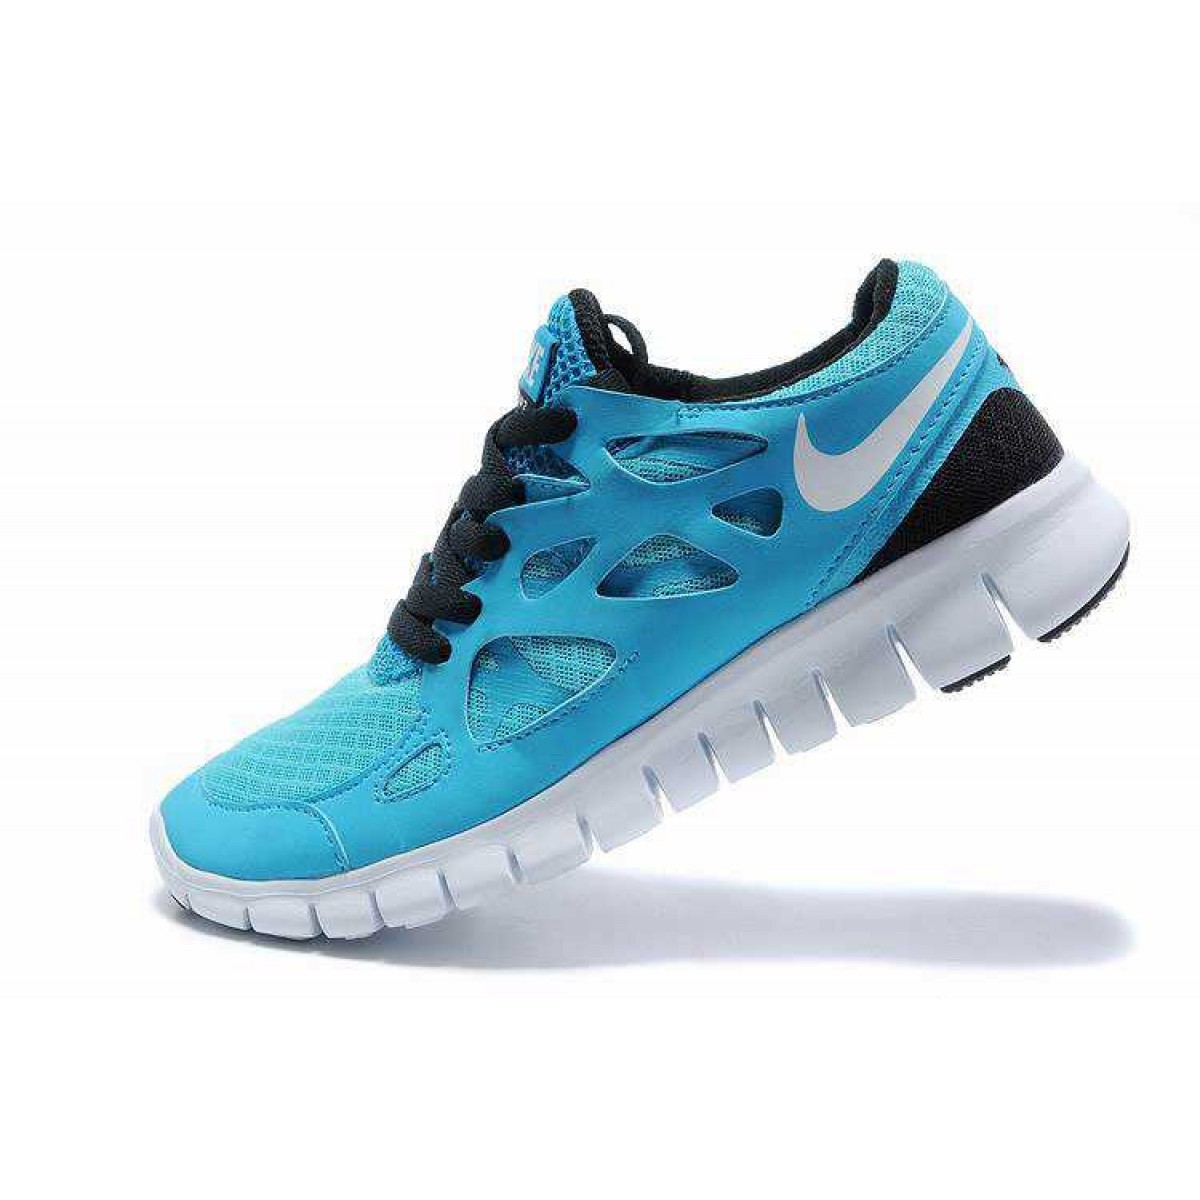 newest aa3b3 438e4 Nike Free Run 2 Homme Chaussures Bleu Blanc,nike free nike dunk high,achetez